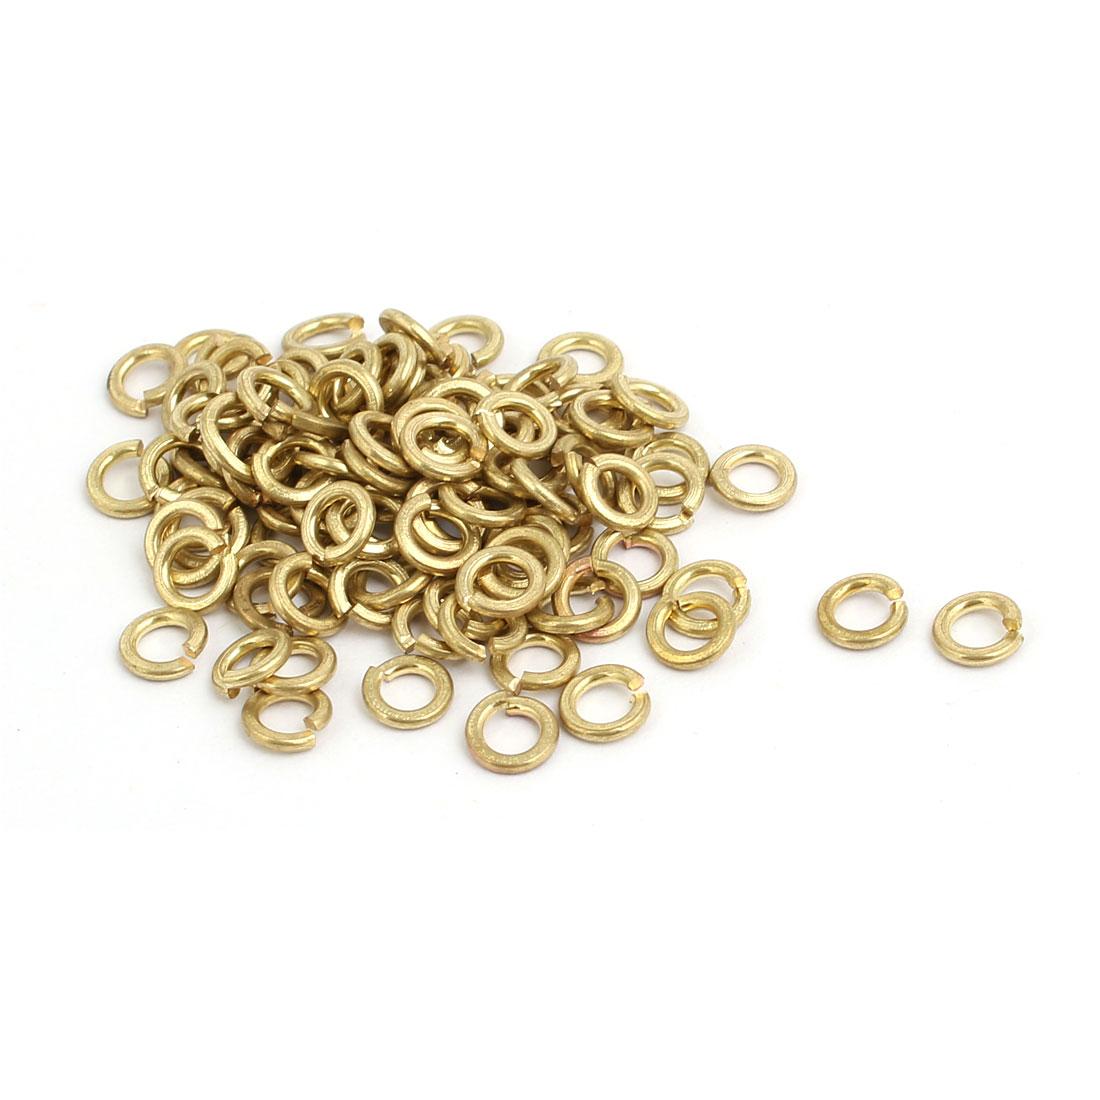 2.5mm Inner Dia Brass Split Lock Spring Washer Gasket Gold Tone 100pcs